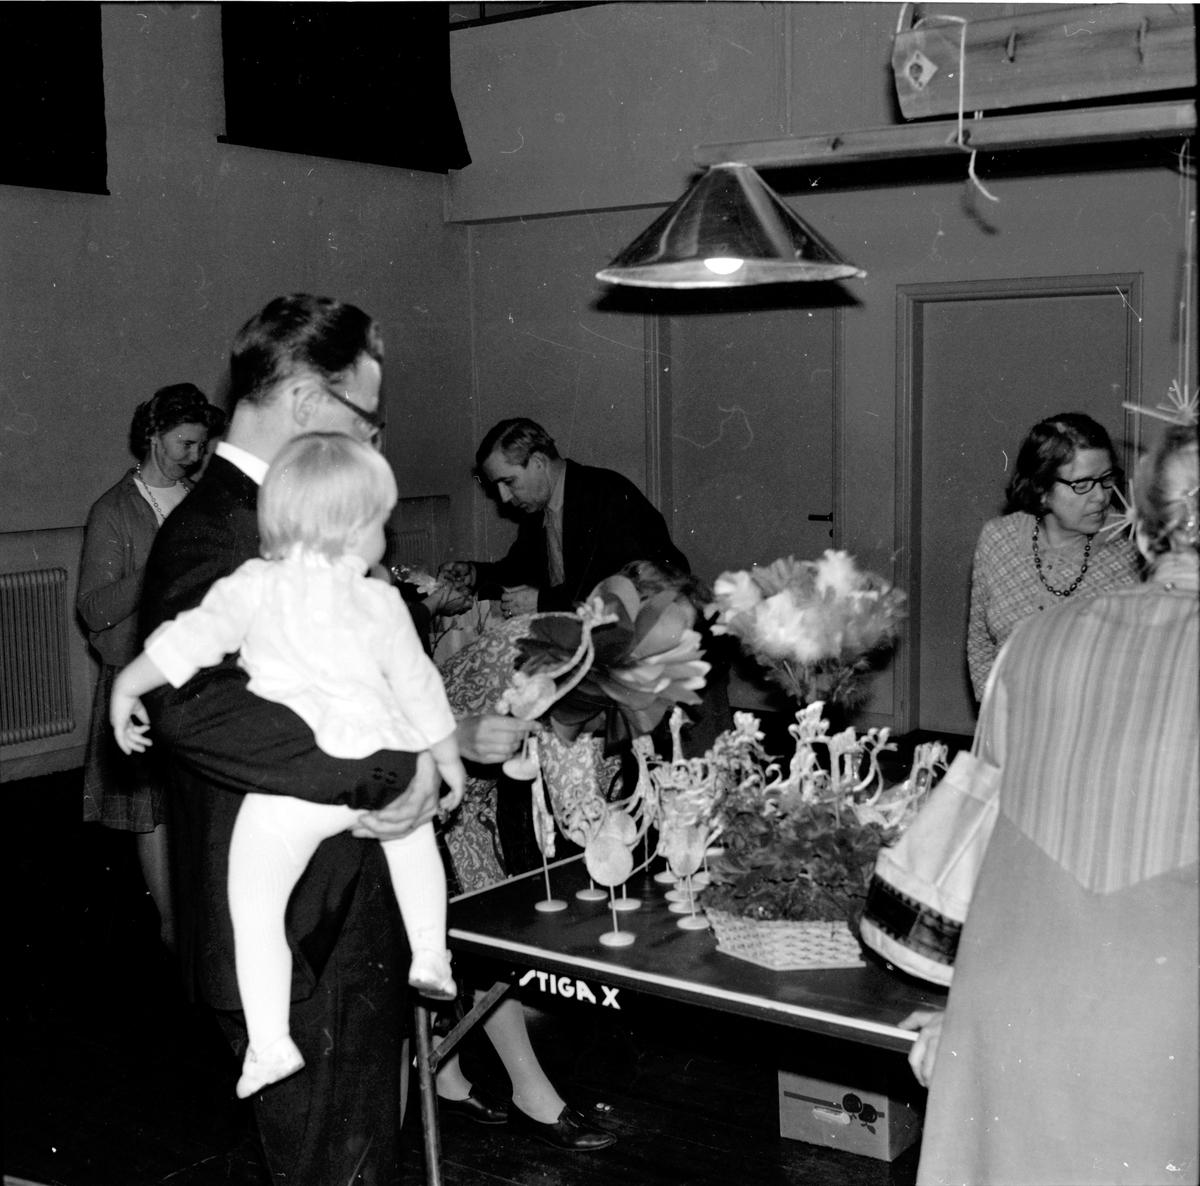 Arbrå, Scouternas fest på Nytorp, April 1969